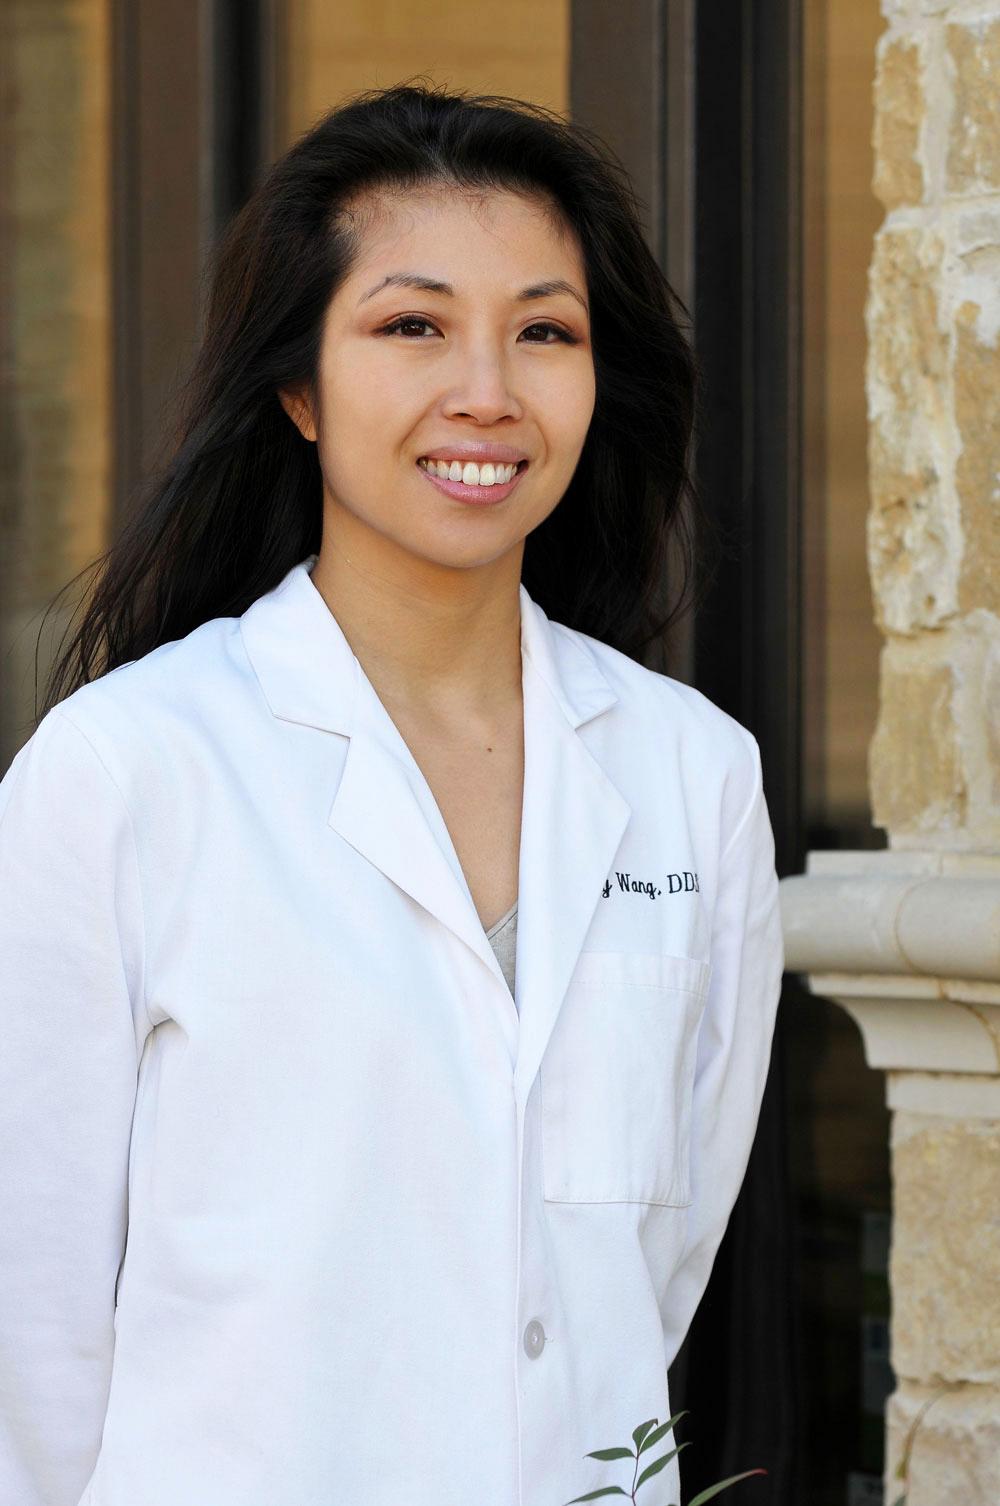 Dr Sandy Wang smiling